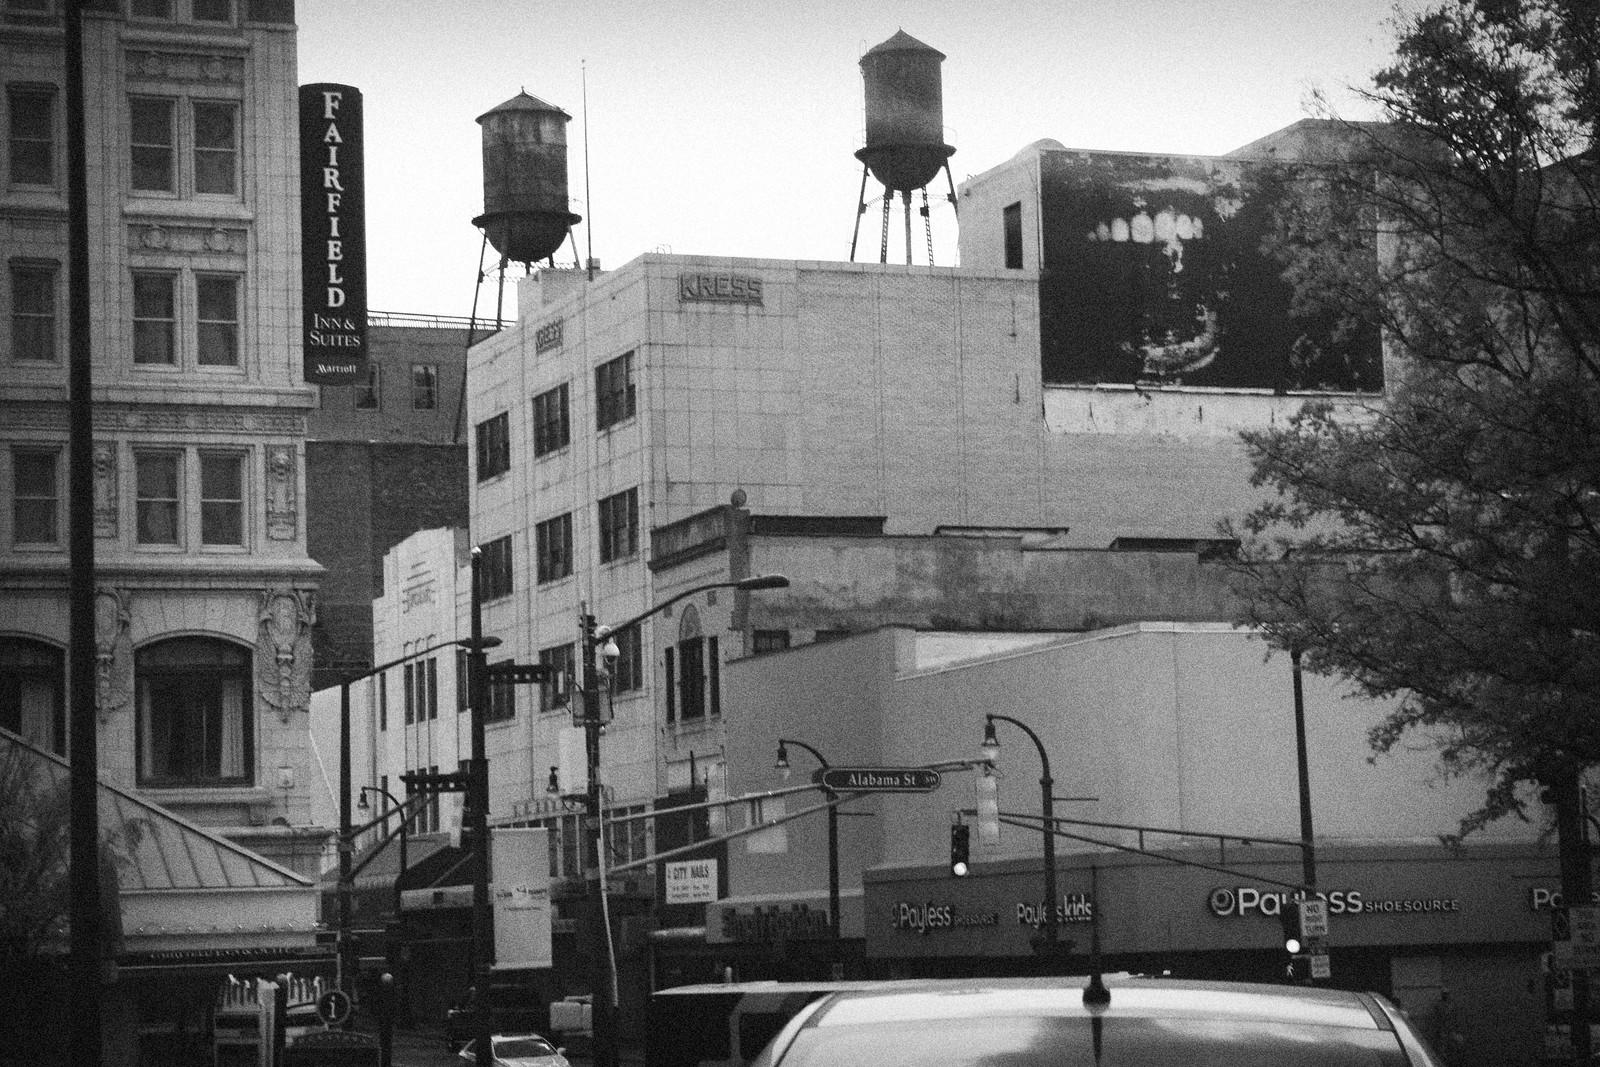 Fairfield Inn and Kress Buildings, Downtown Atlanta